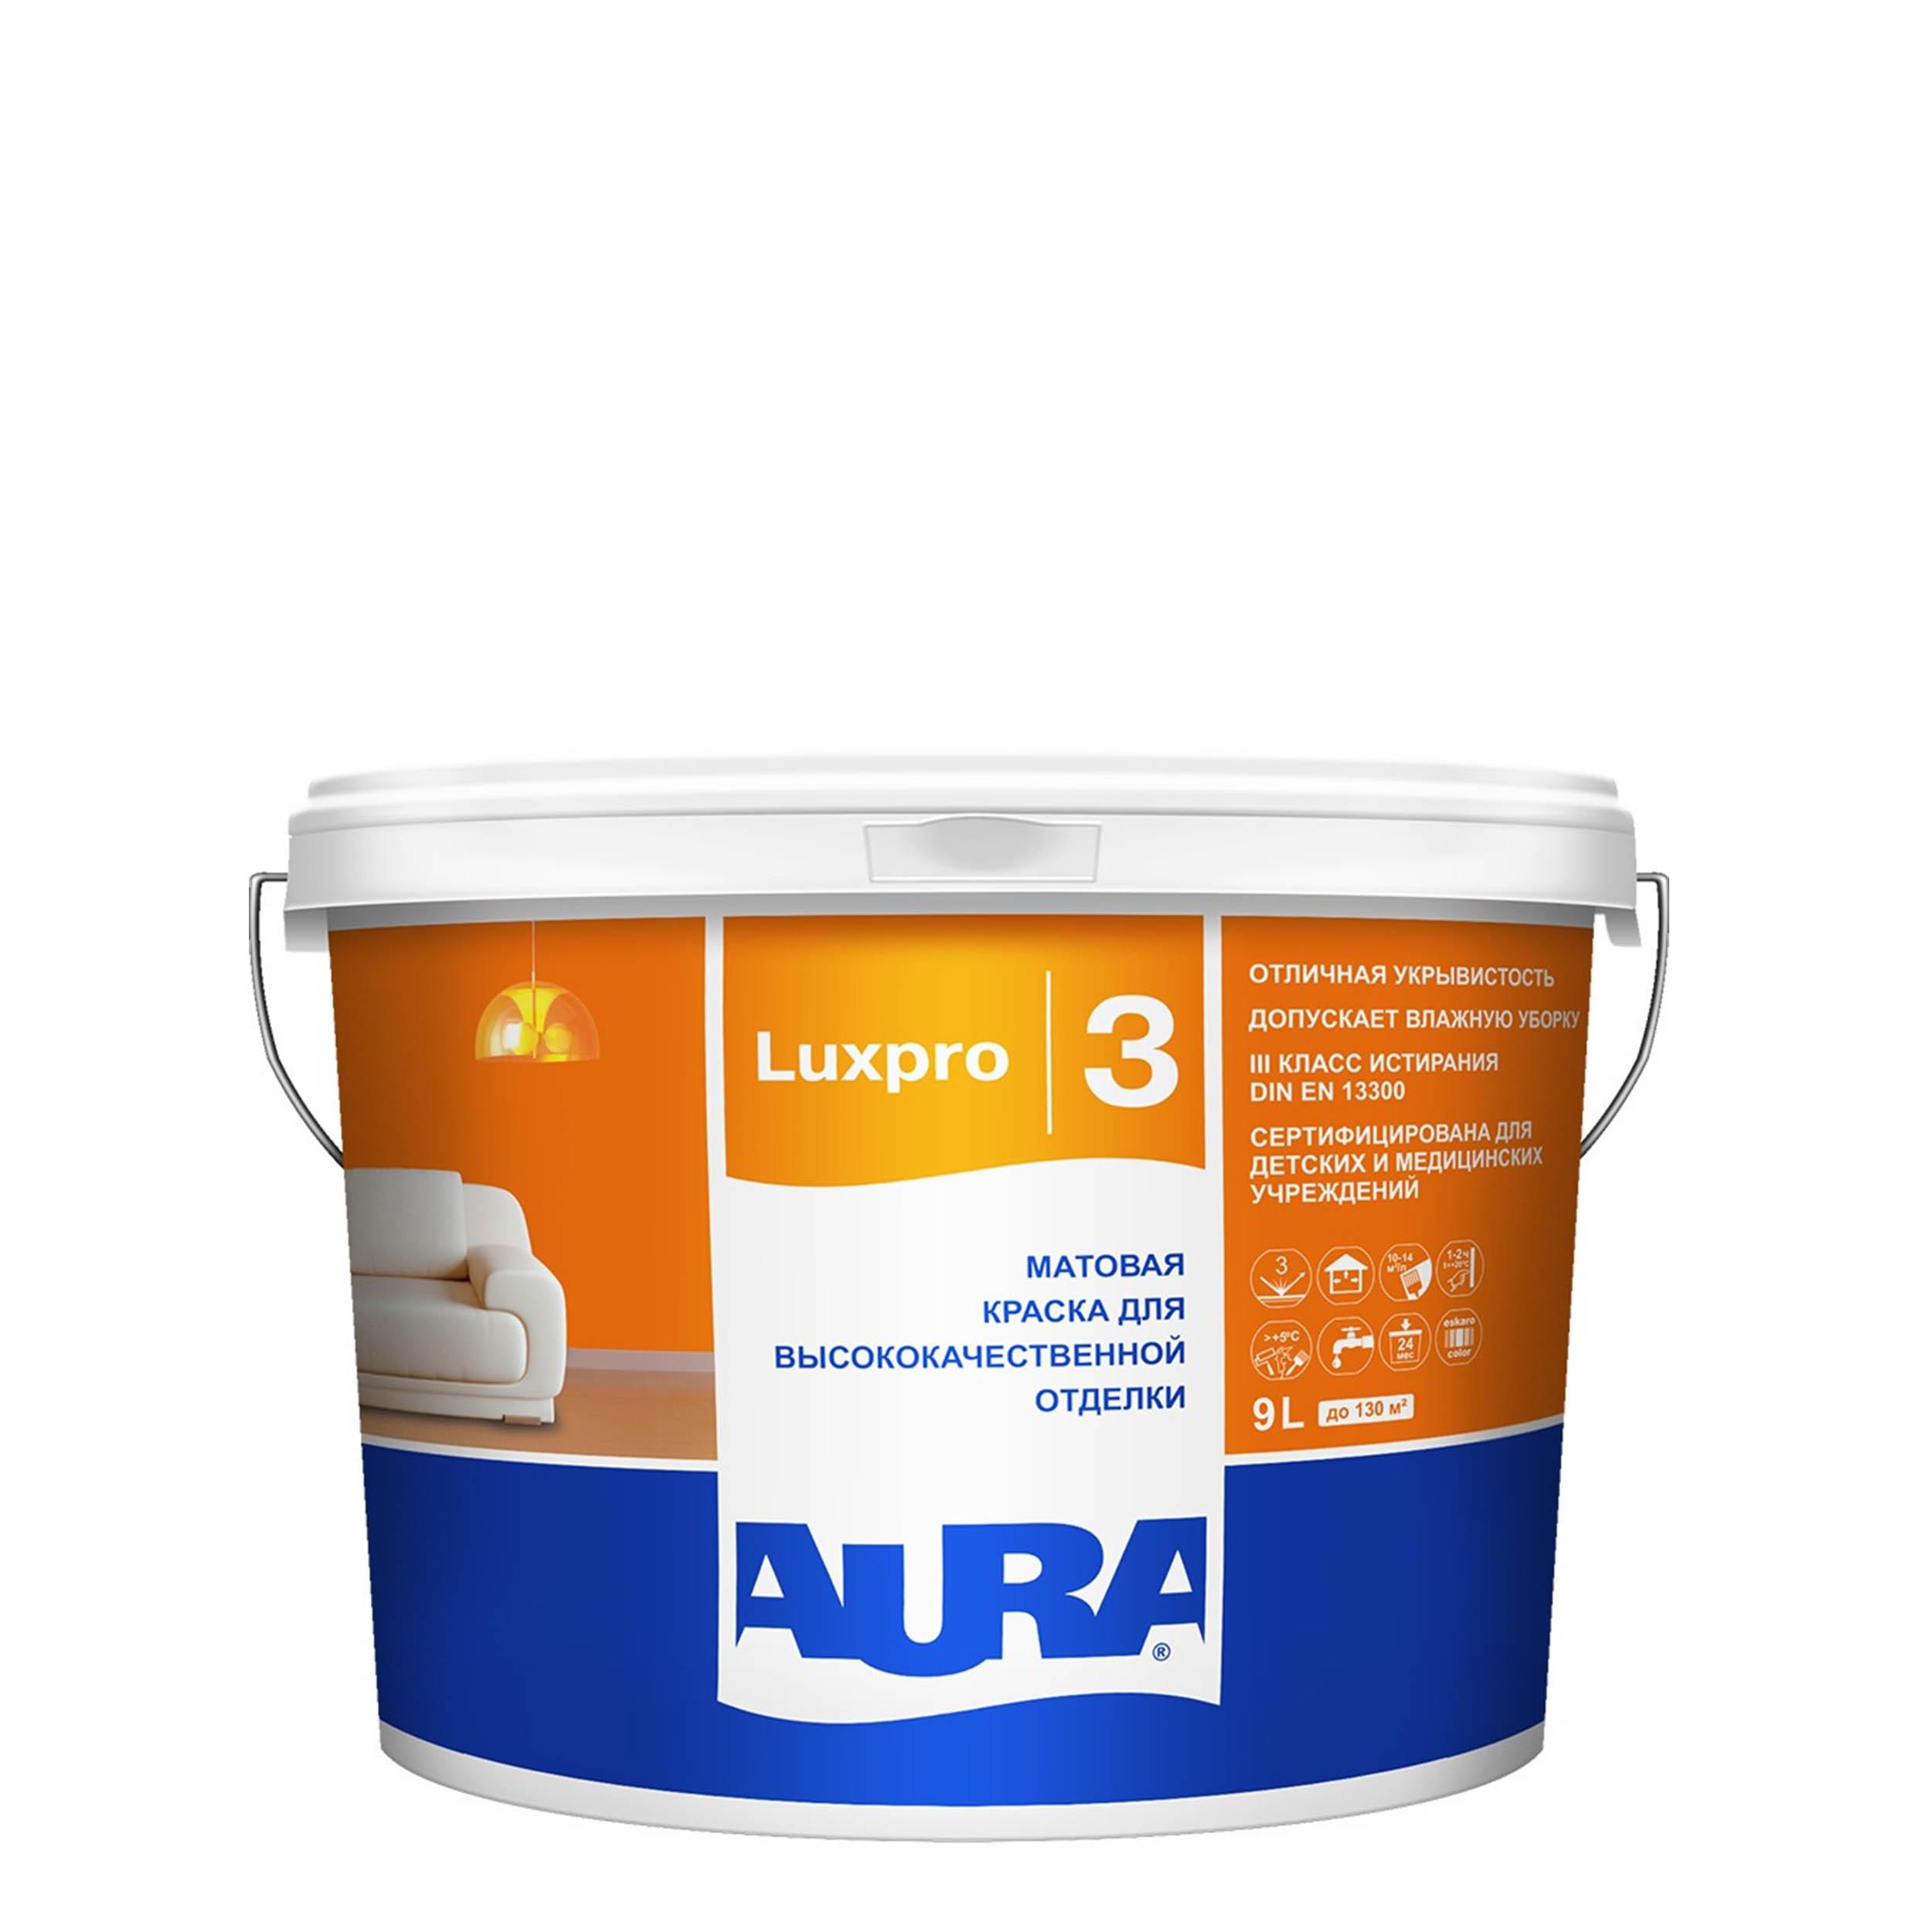 Фото 3 - Краска интерьерная, Aura LuxPRO 3, RAL 7033, 11 кг.